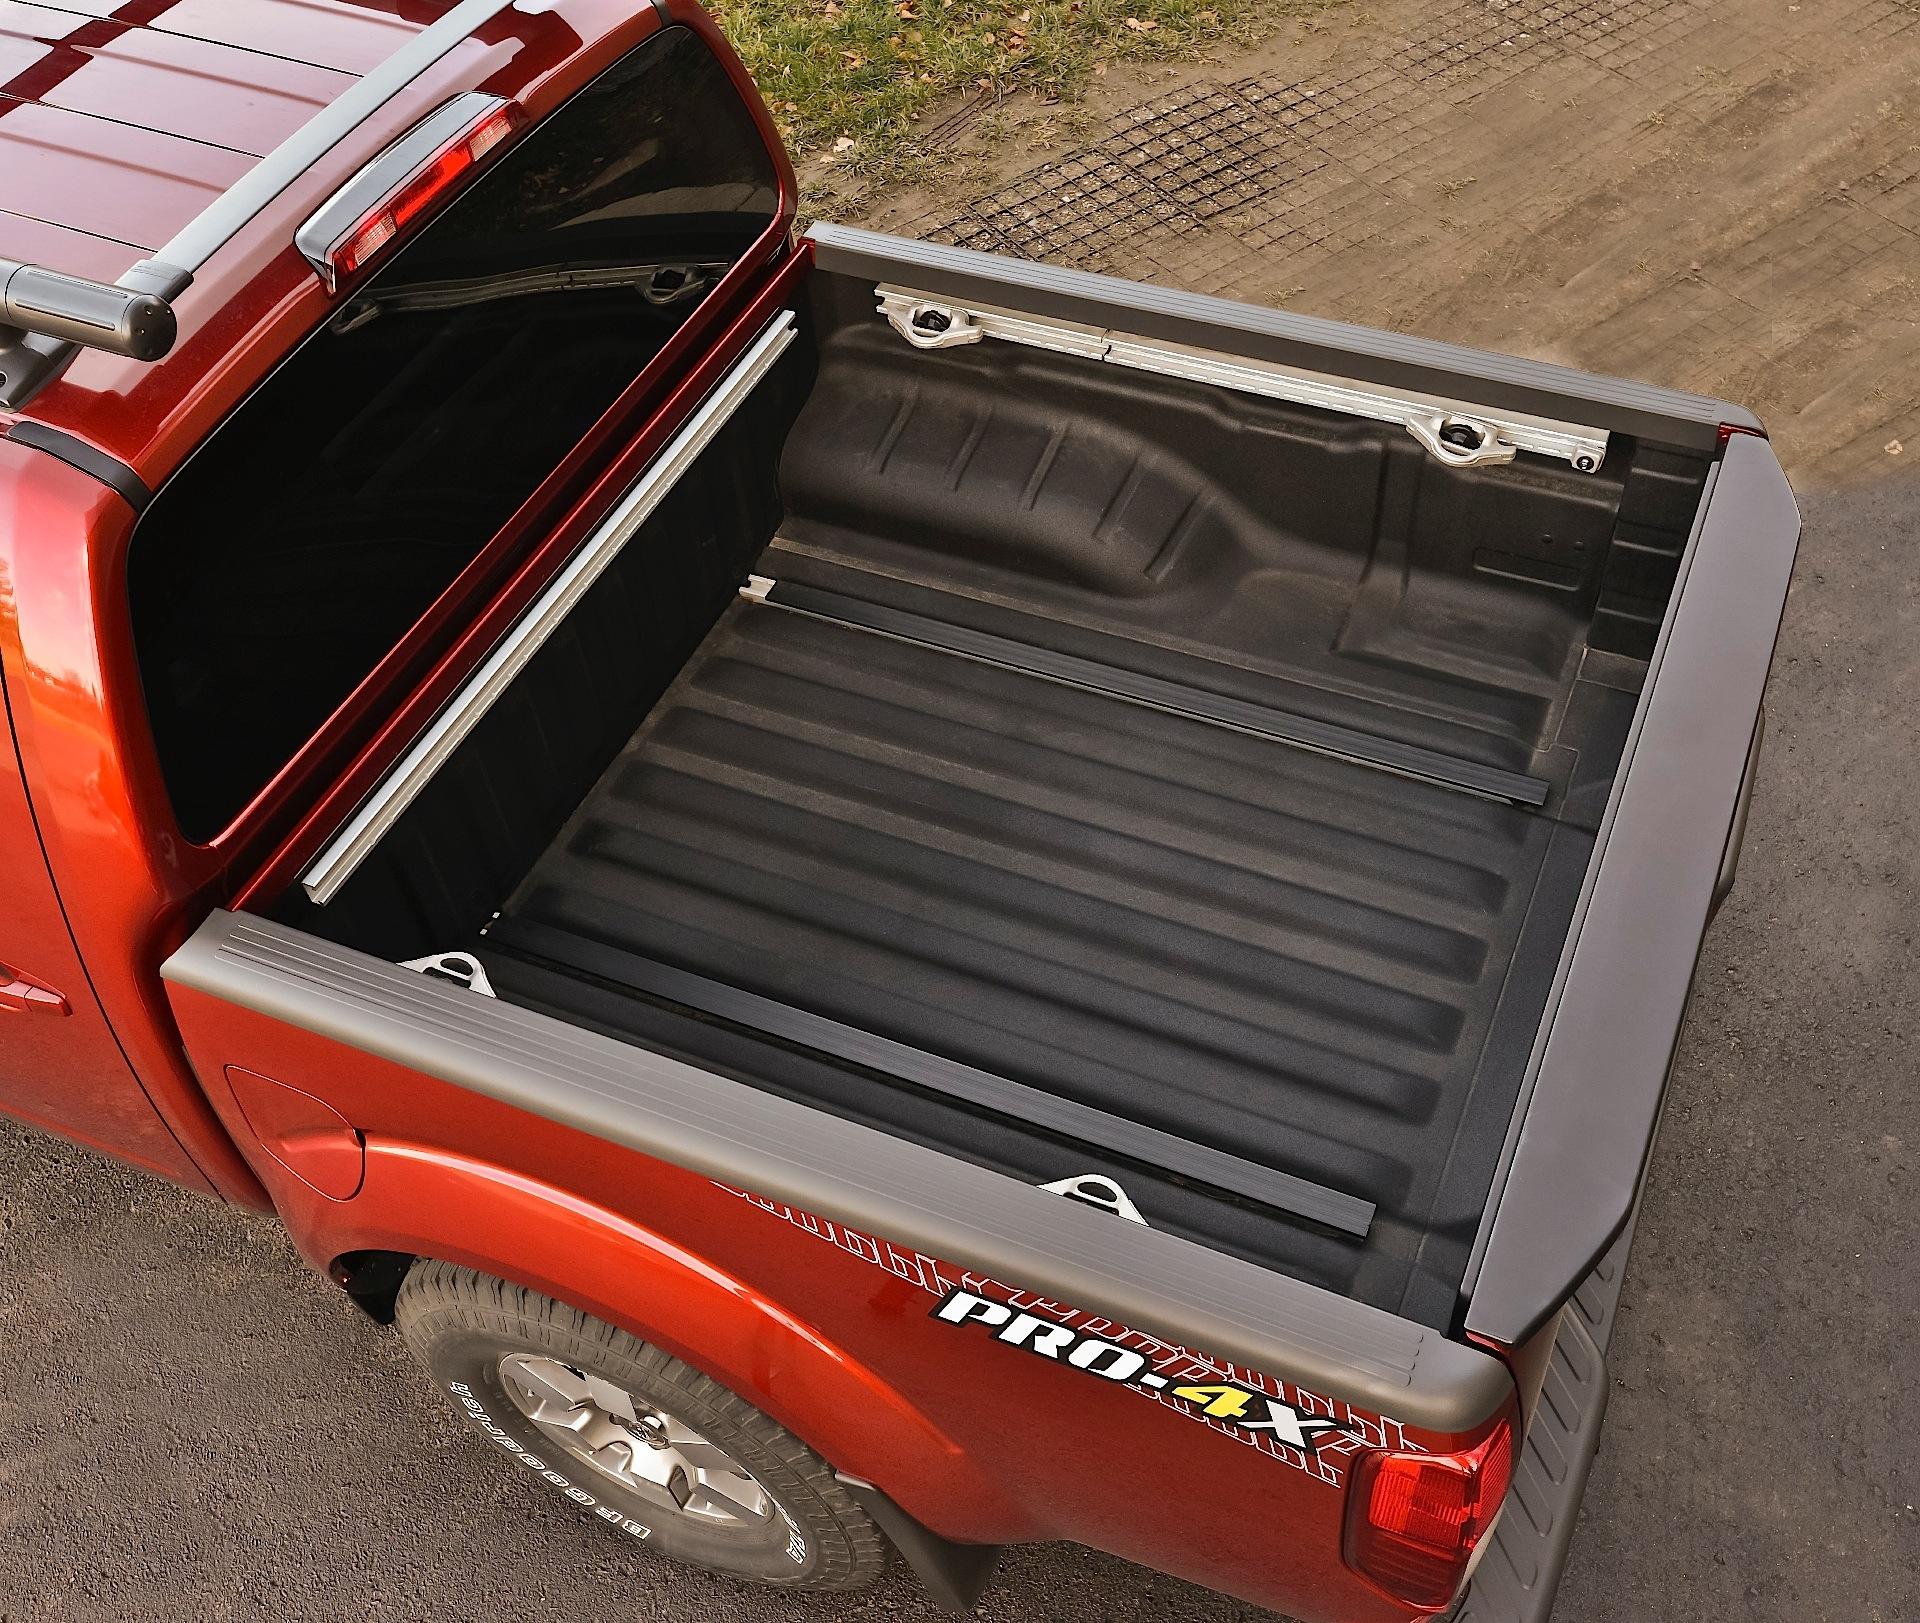 2010 Nissan Titan King Cab Camshaft: NISSAN Frontier Specs & Photos